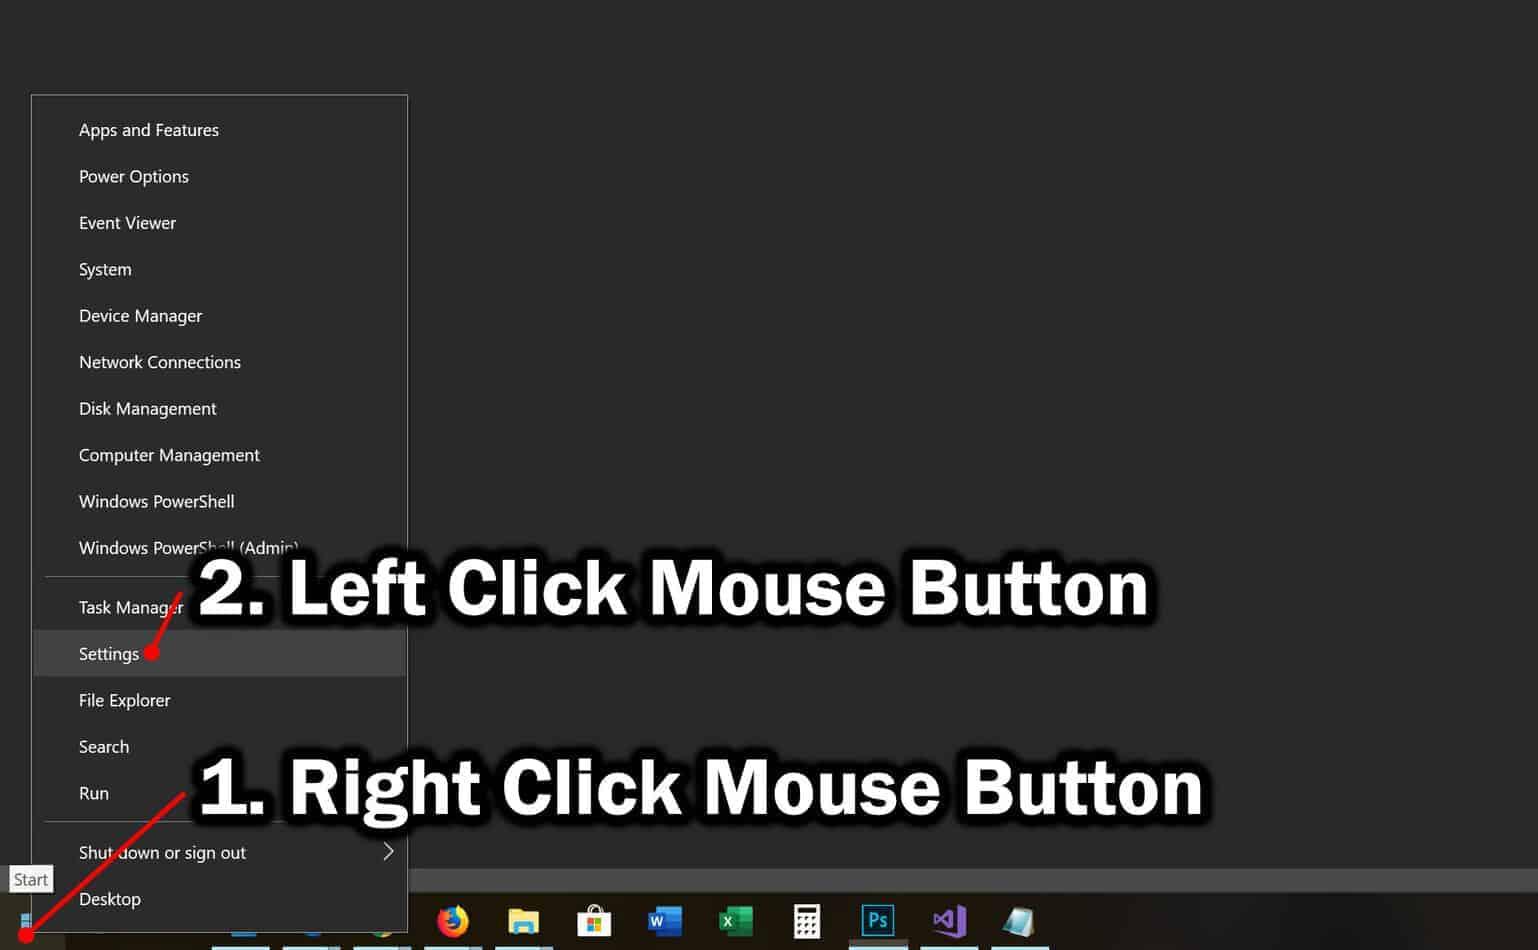 open settings app from start contextual menu